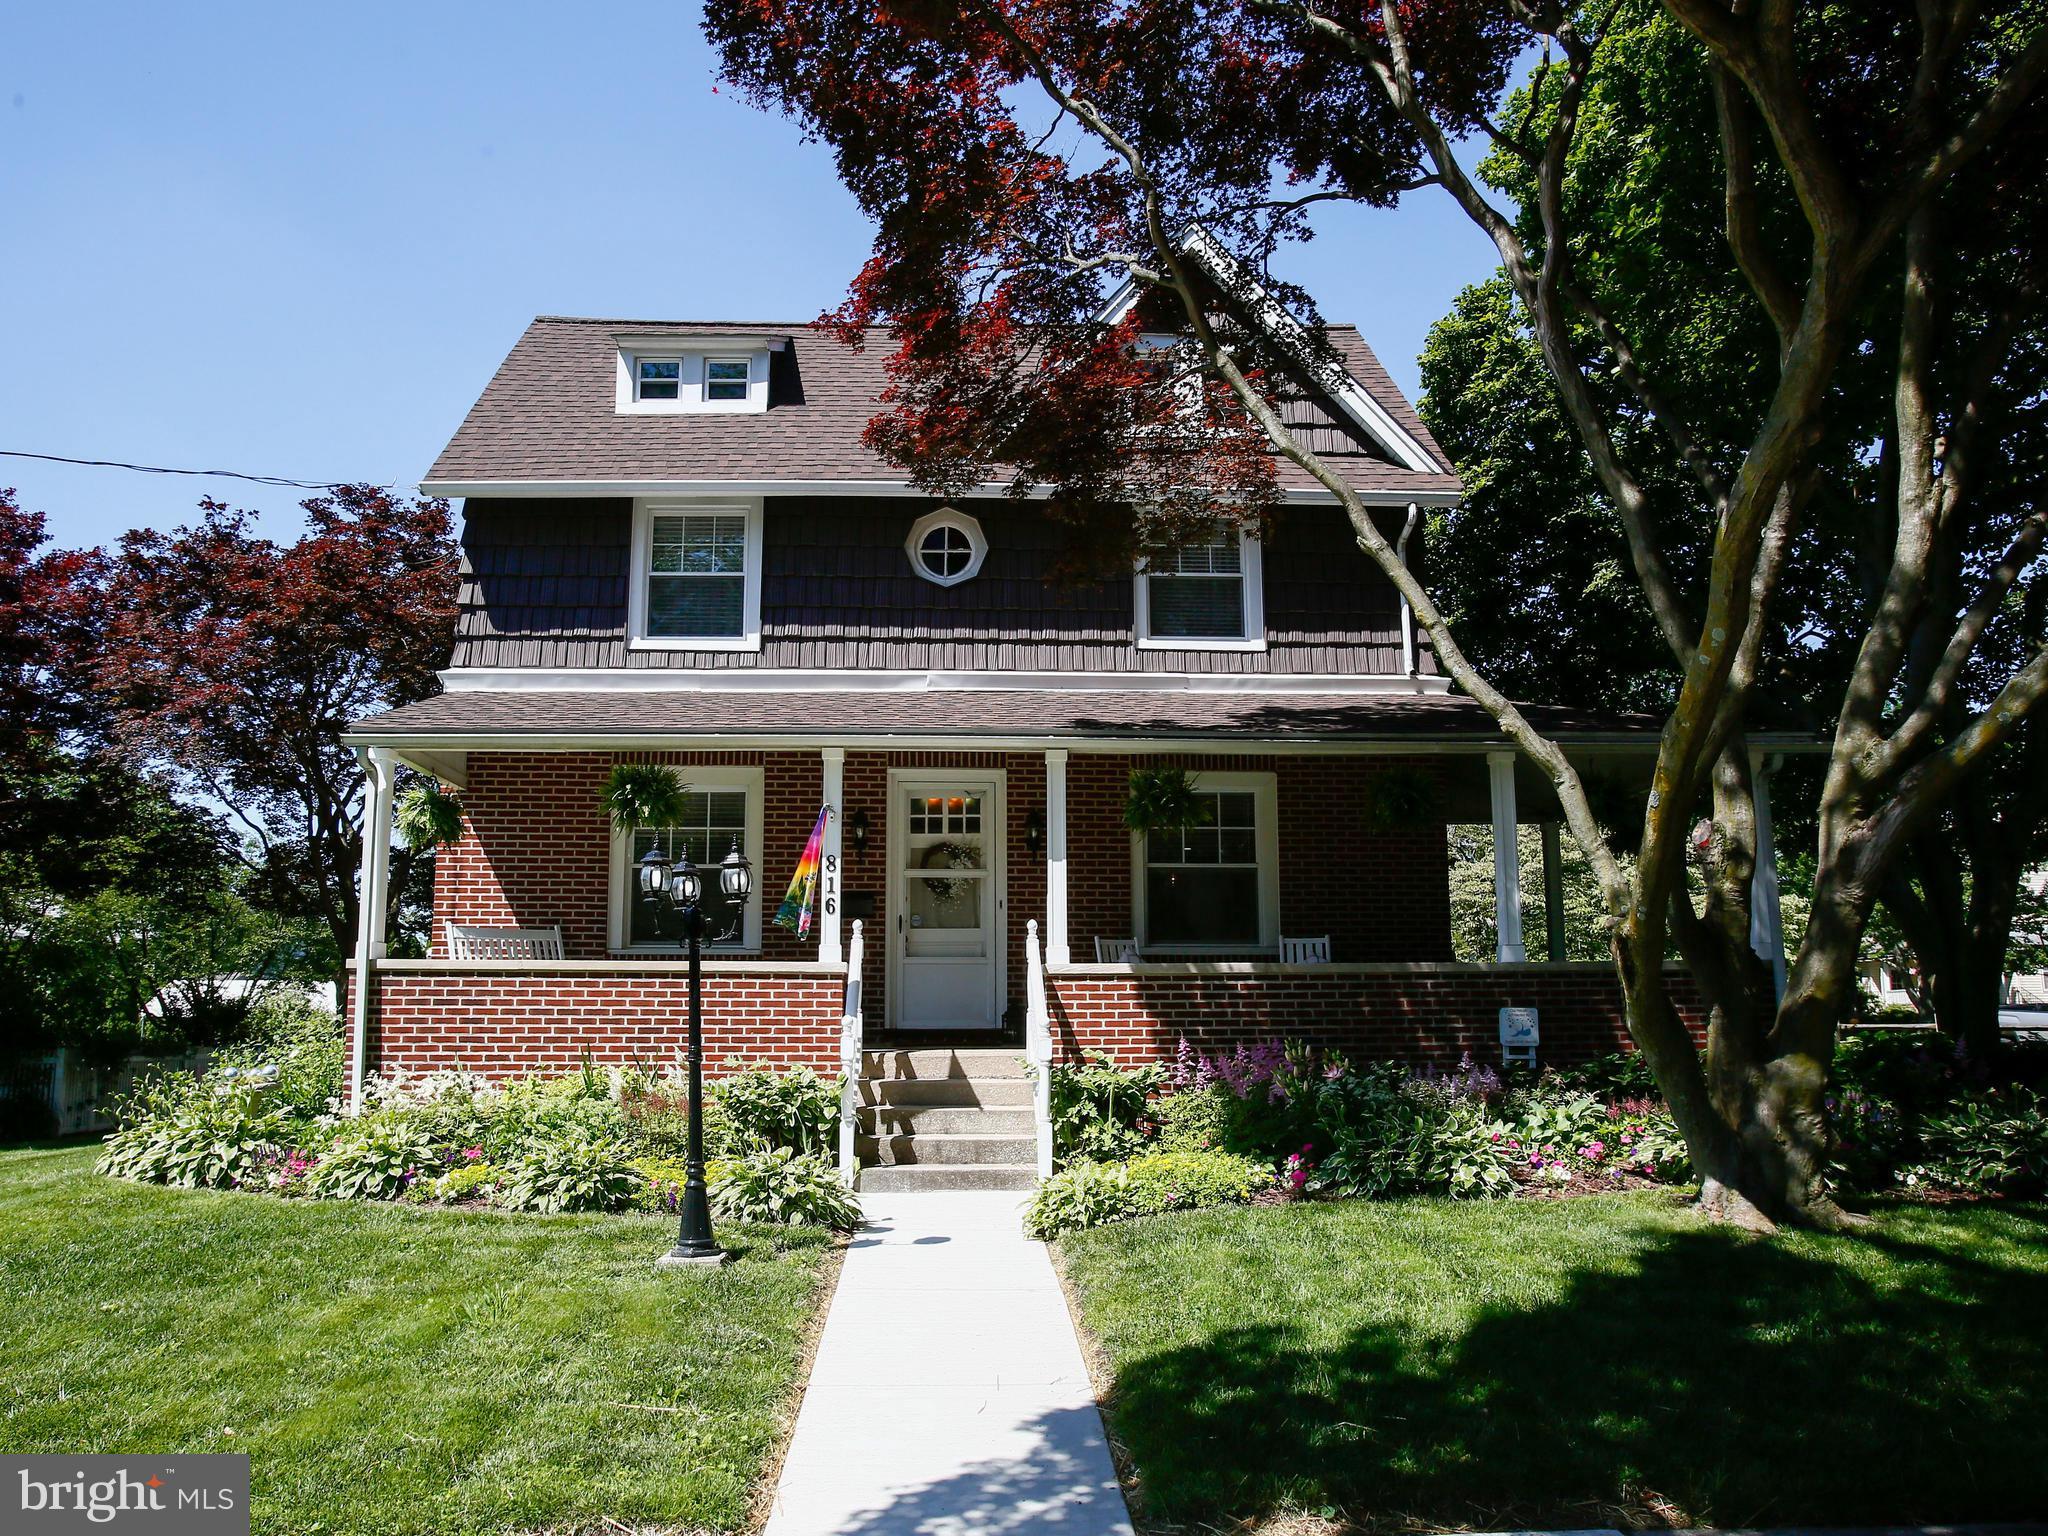 816 Prospect Avenue, Prospect Park, PA 19076